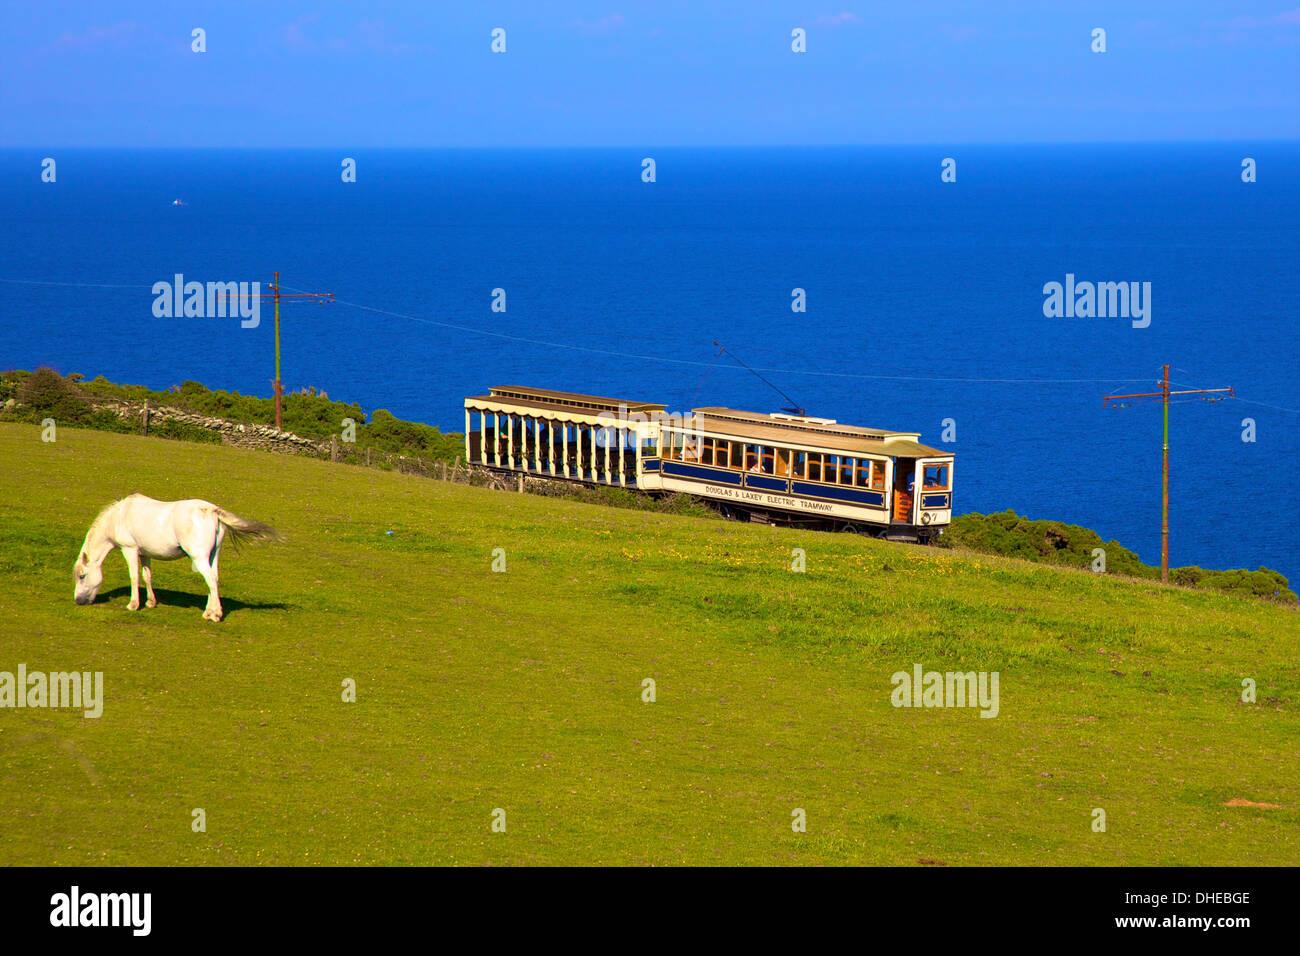 Manx Electric Railway, Isle of Man, Europe - Stock Image